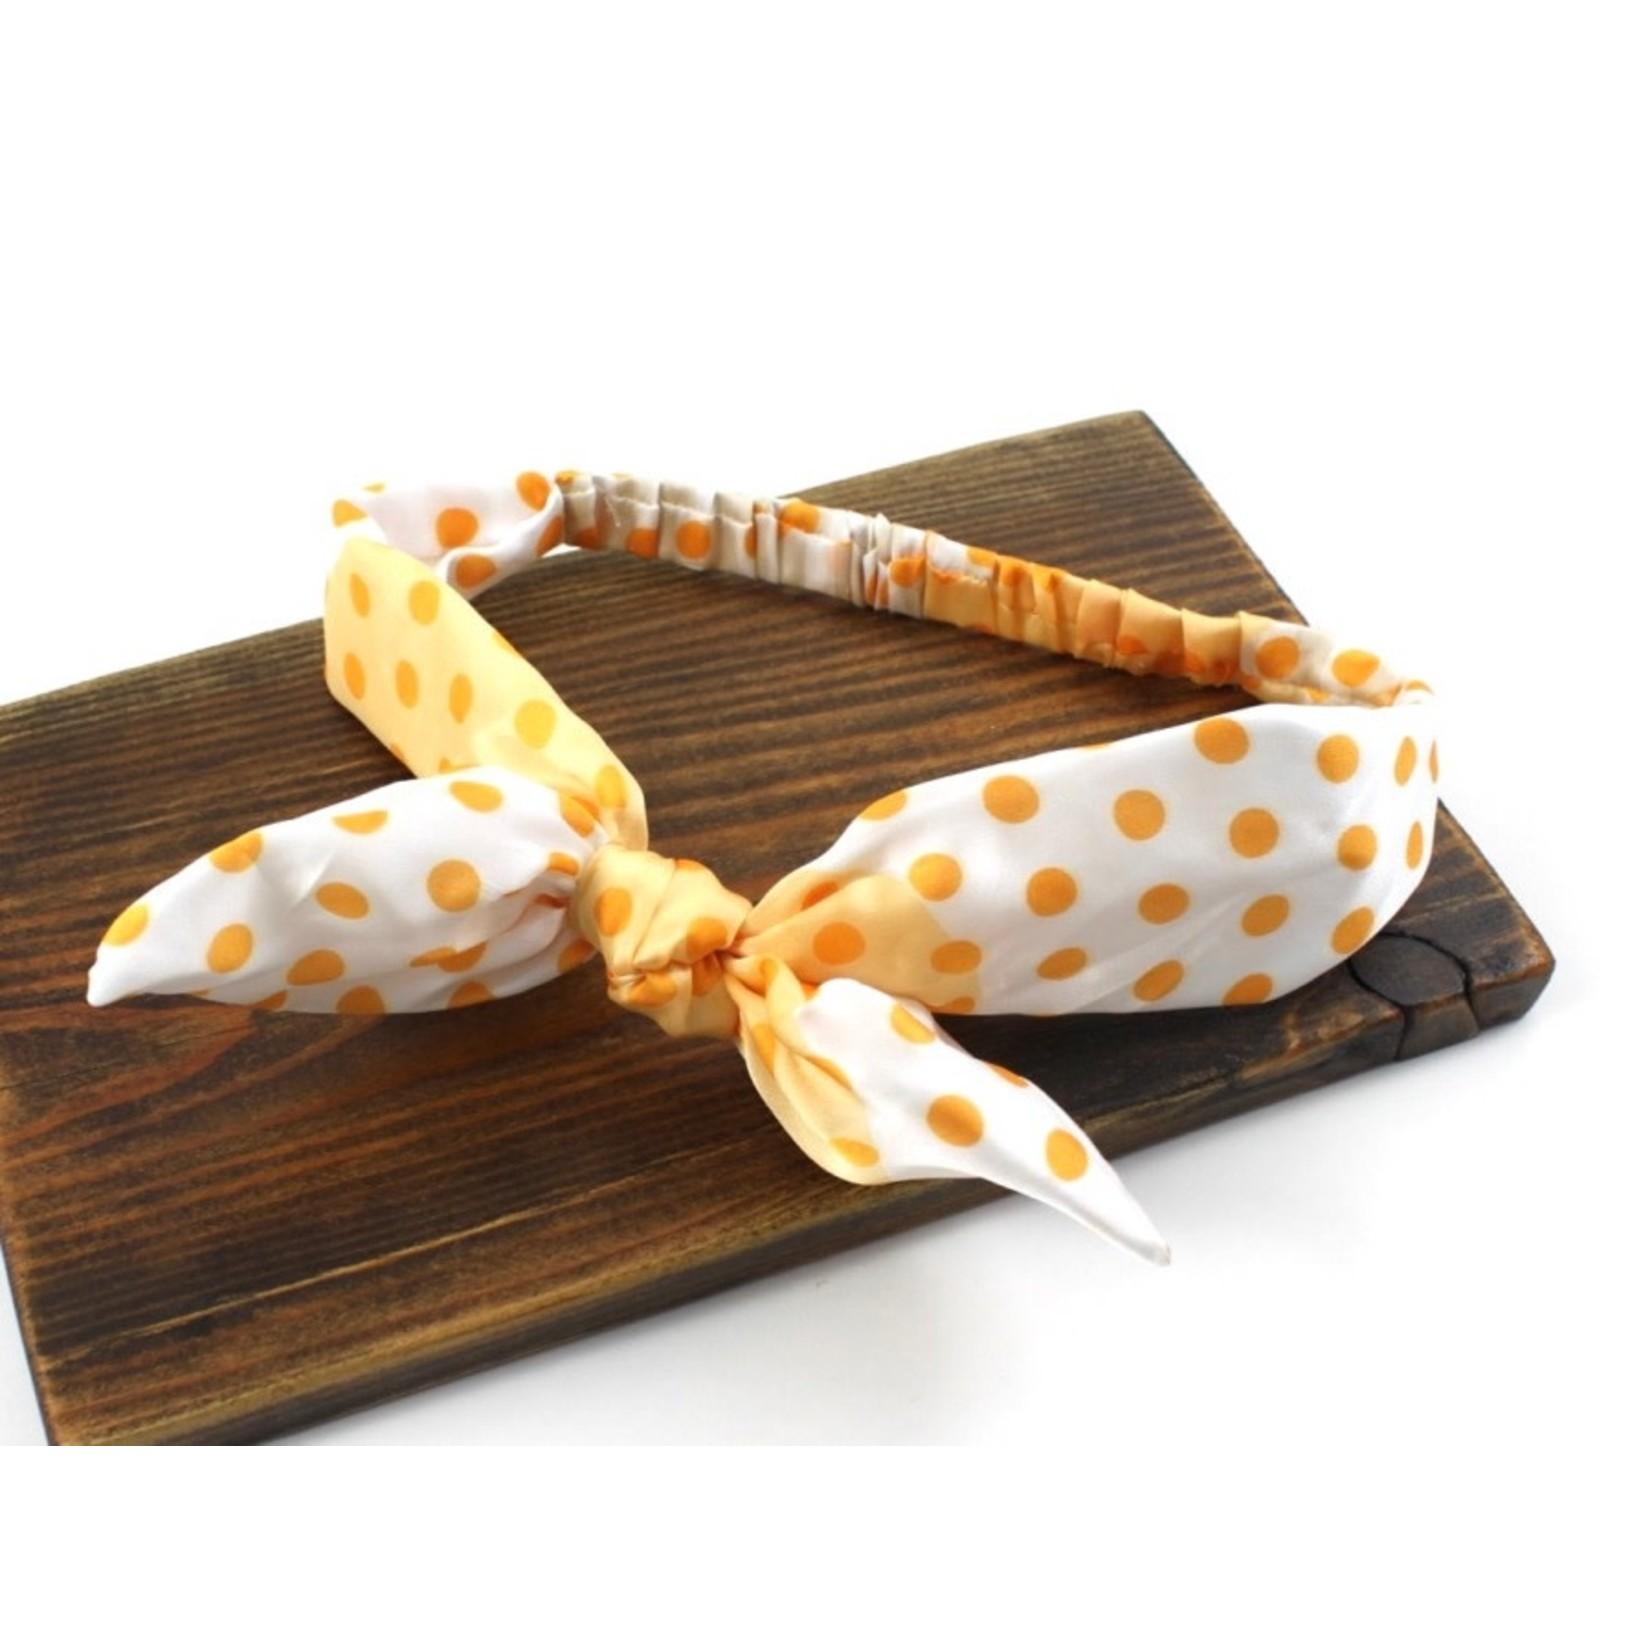 Pullover Headband in Orange w/ Polka Dots